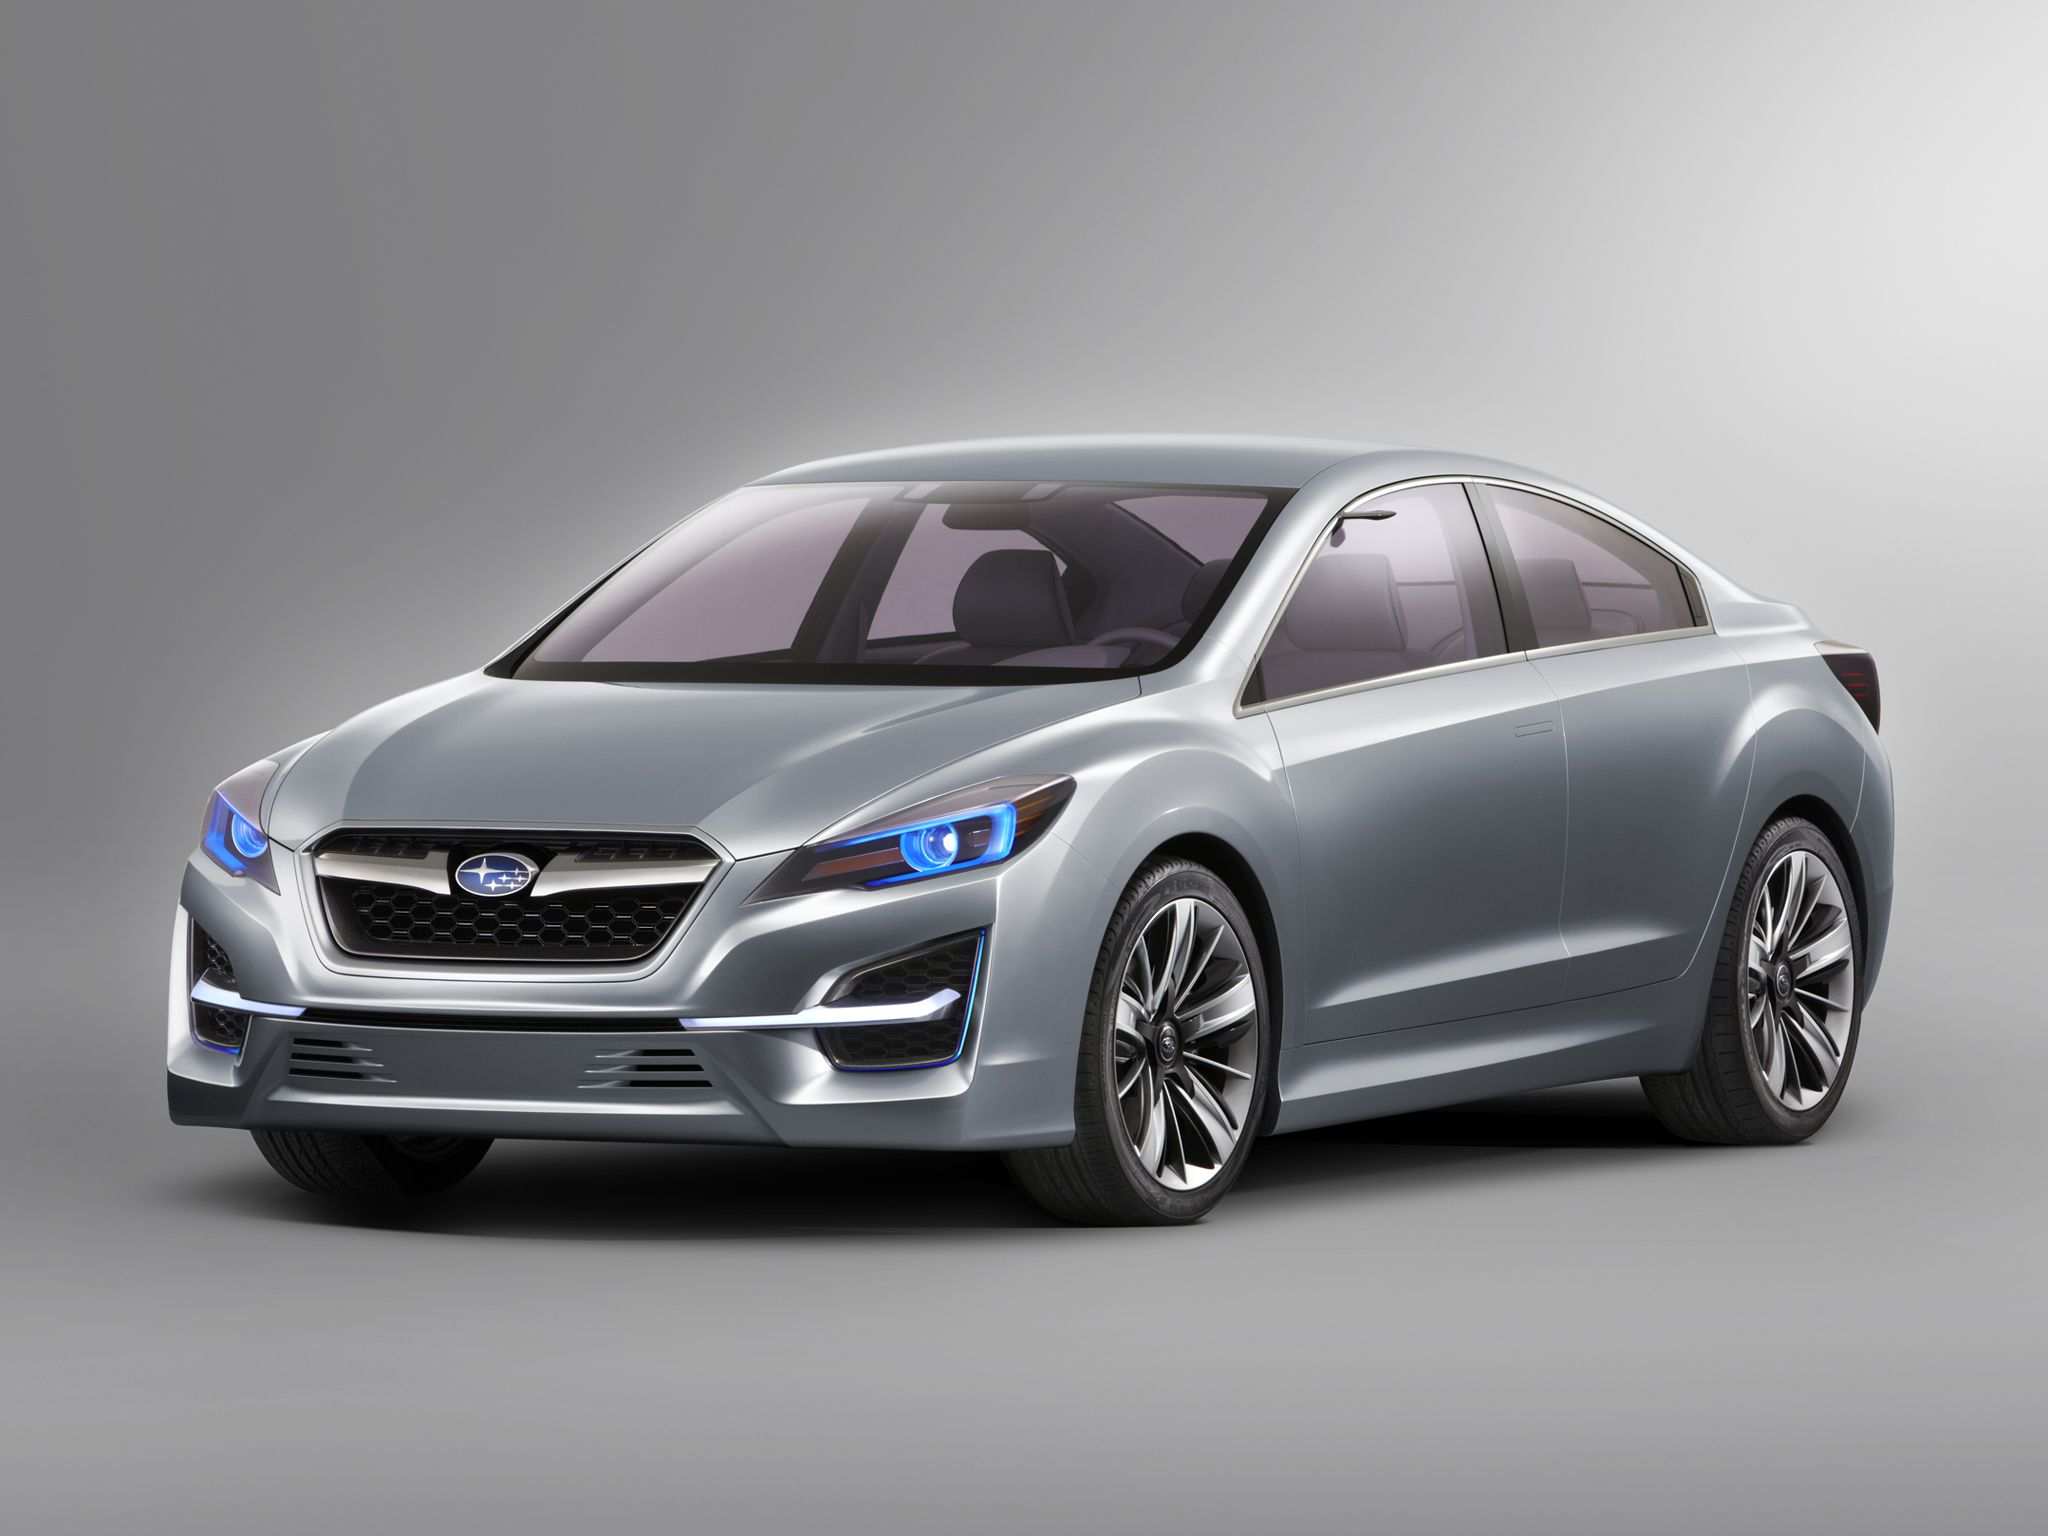 Subaru Impreza Concept (With images) Subaru impreza